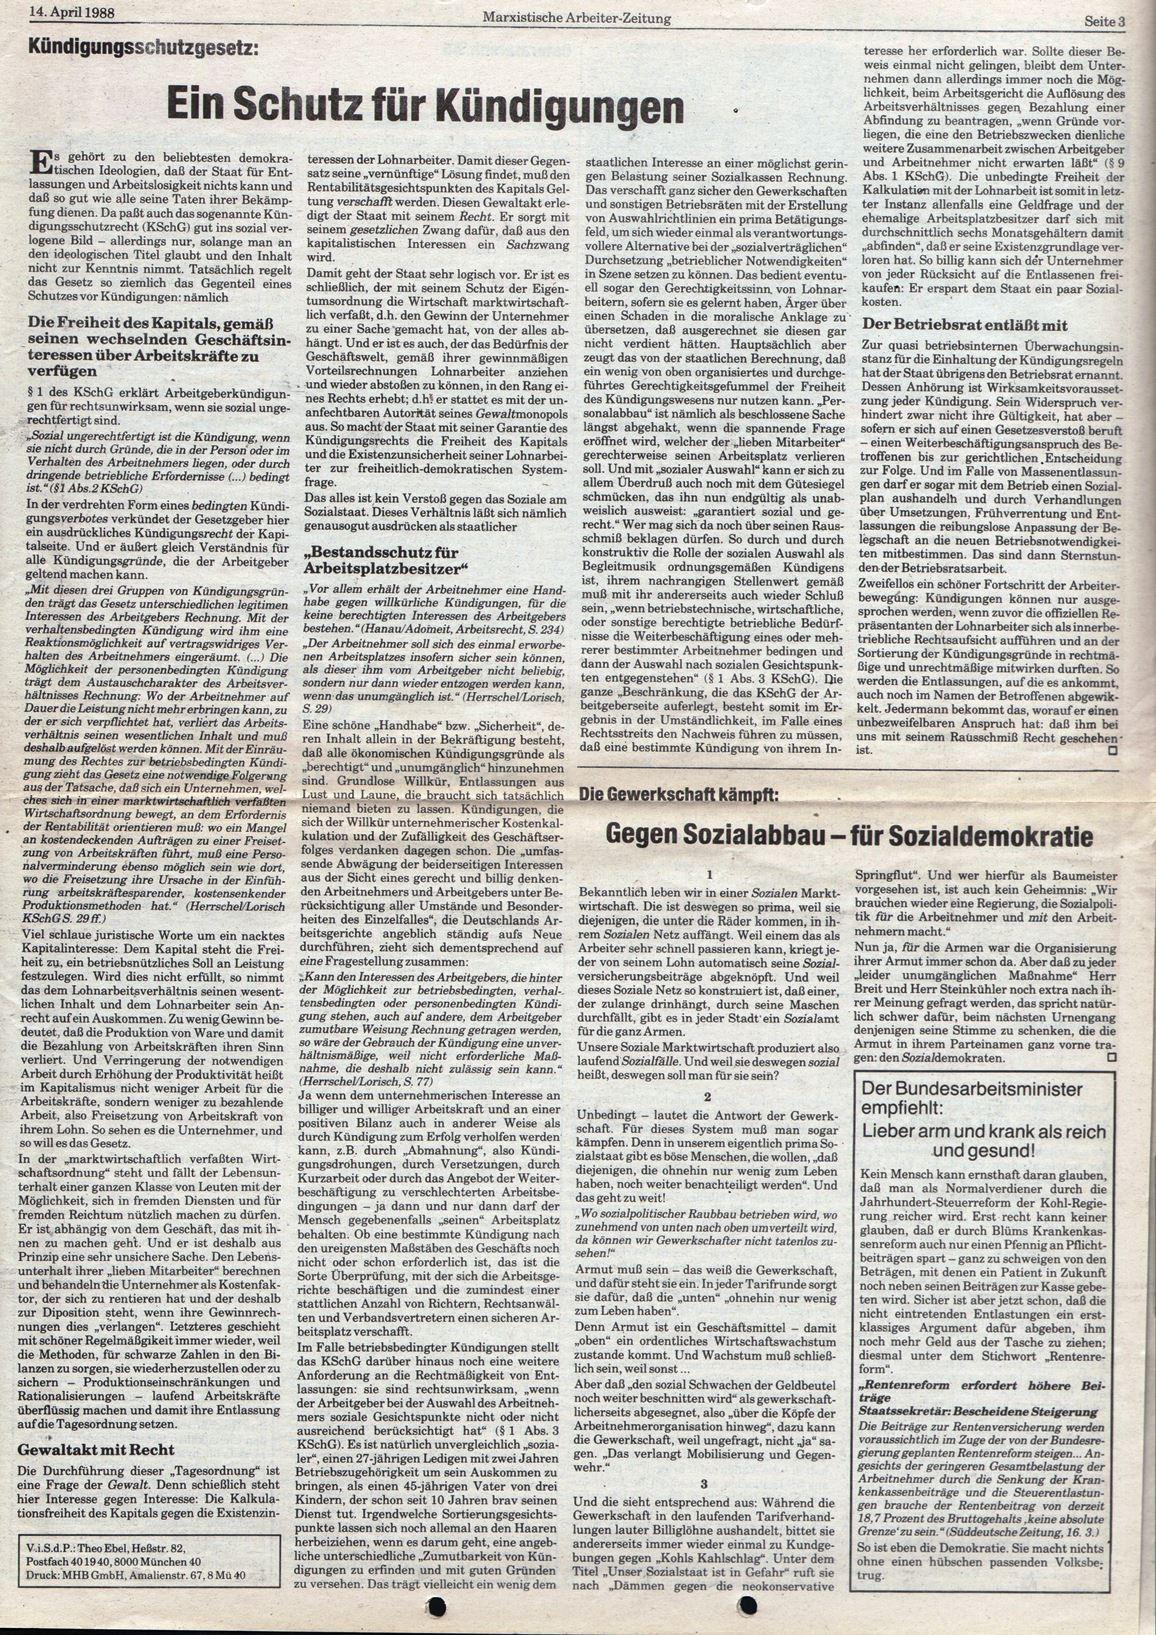 Muenchen_MG_MAZ_19880414_03